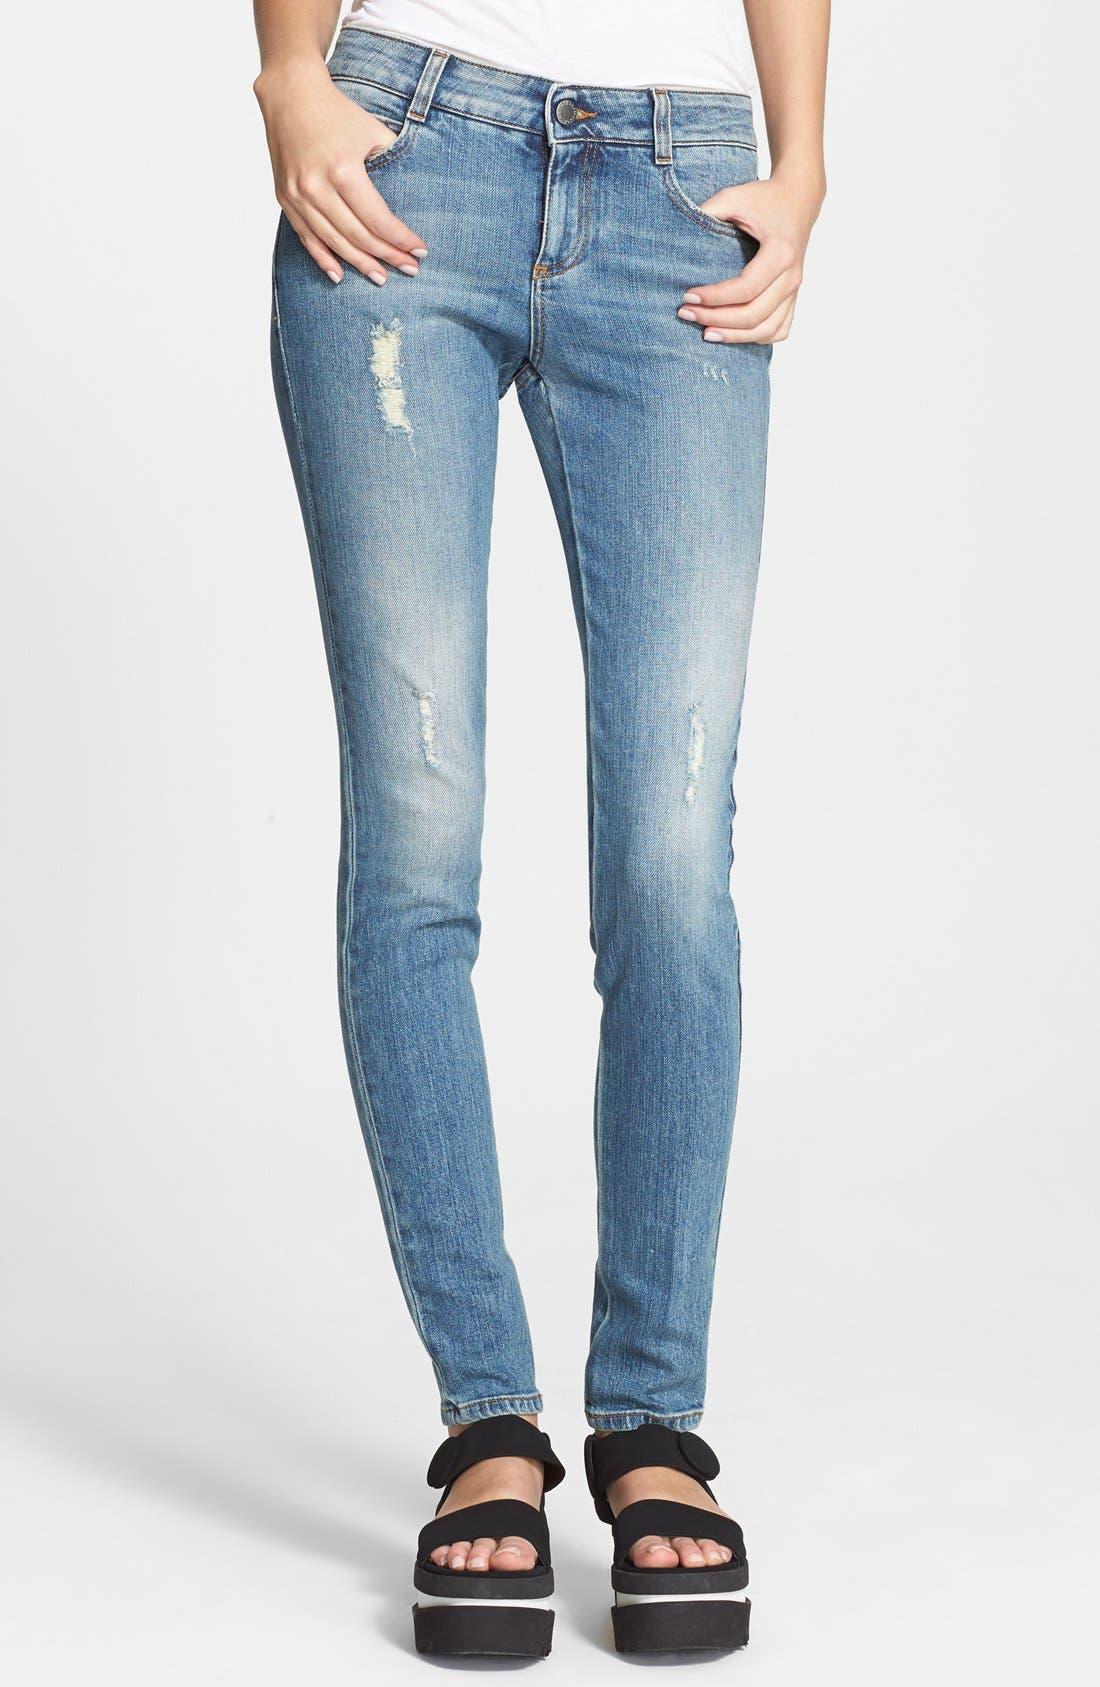 Main Image - Stella McCartney 'The Skinny Long' Jeans